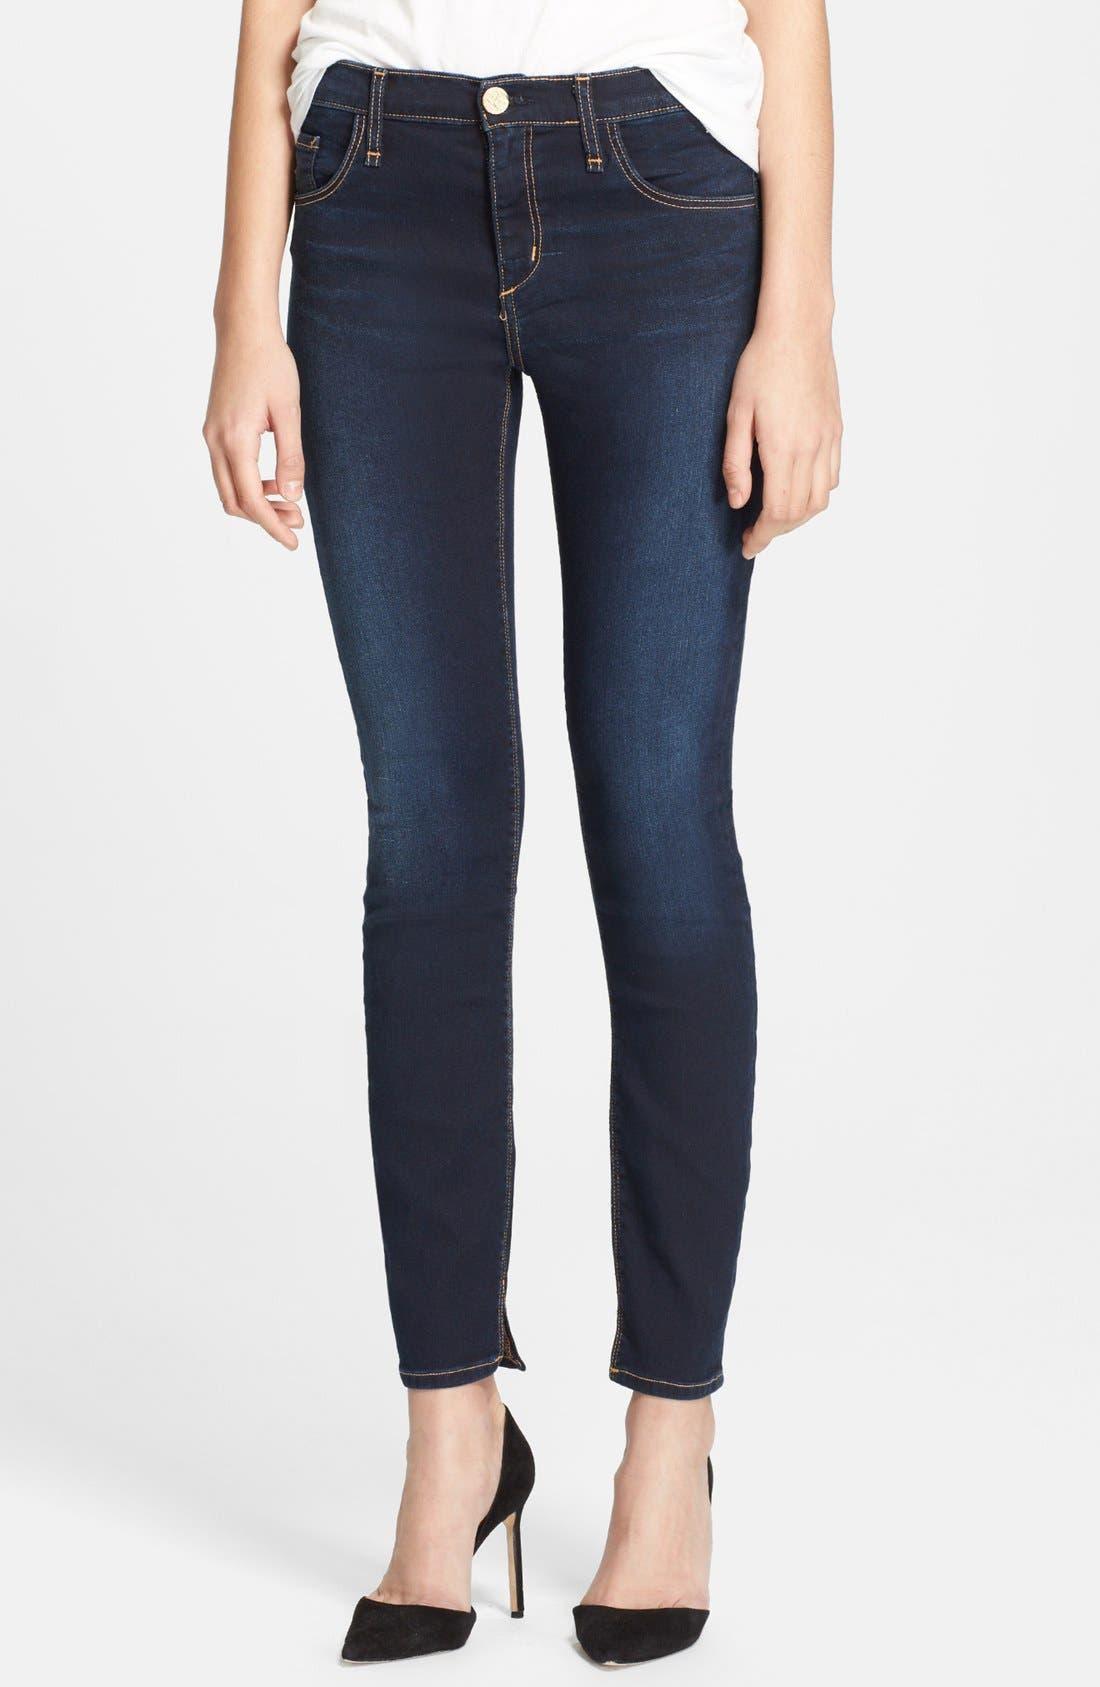 Main Image - McGuire Skinny Ankle Jeans (Atlantic Blue)